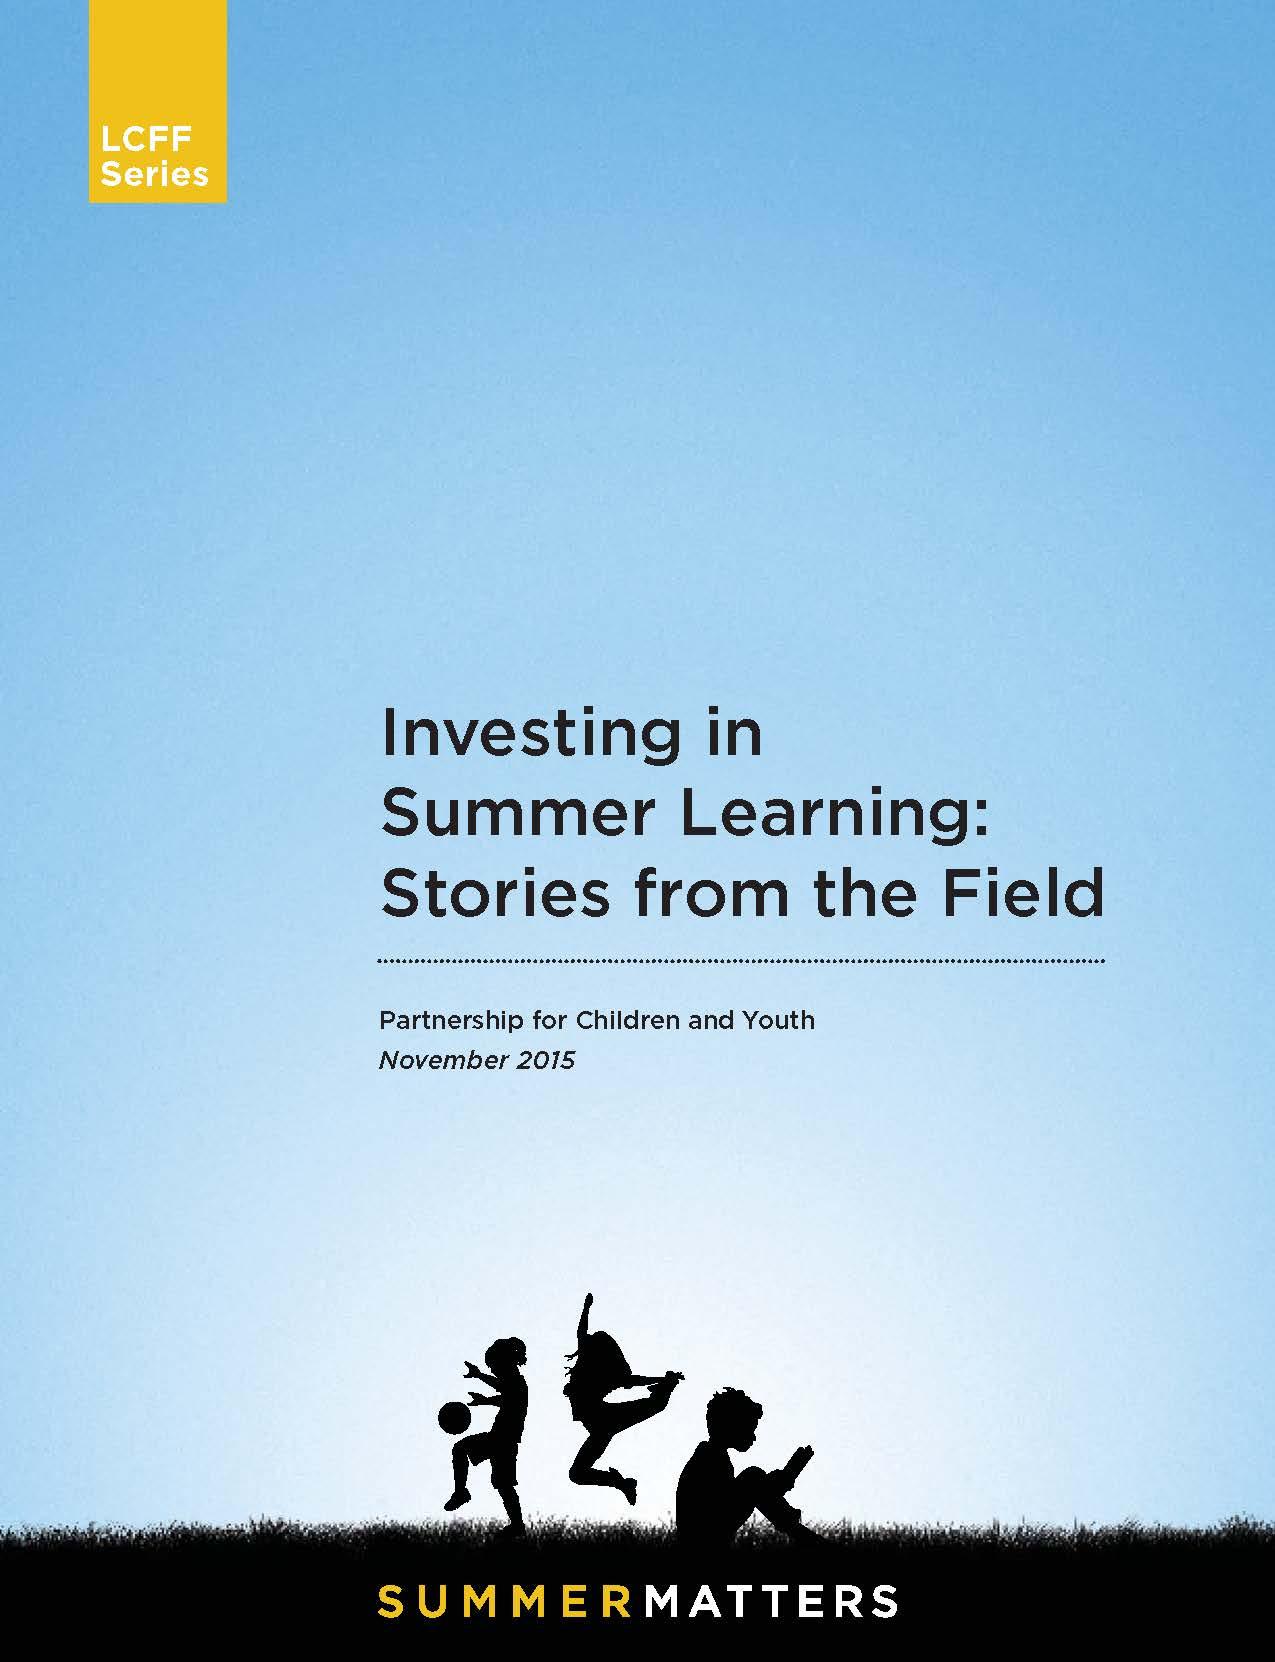 Front Page Image_Summer Matters FieldStories.jpg